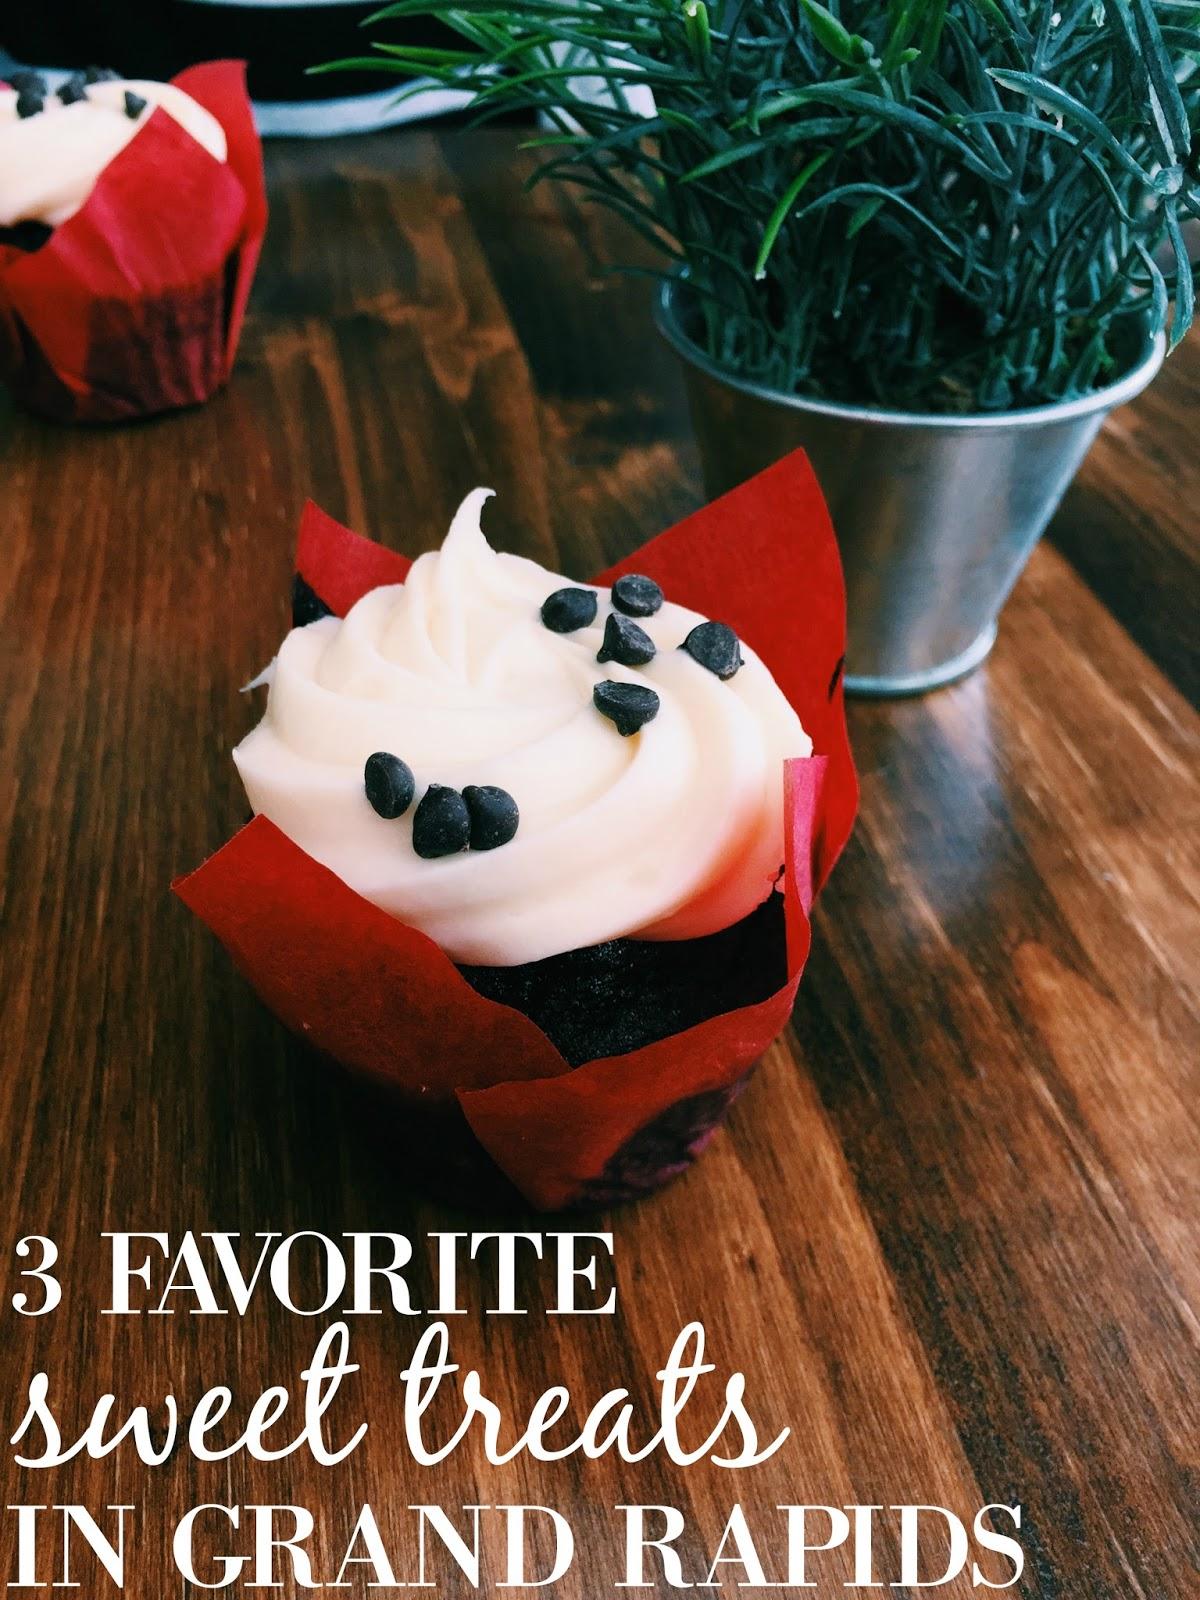 Favorite 3 Sweet Treats in Grand Rapids